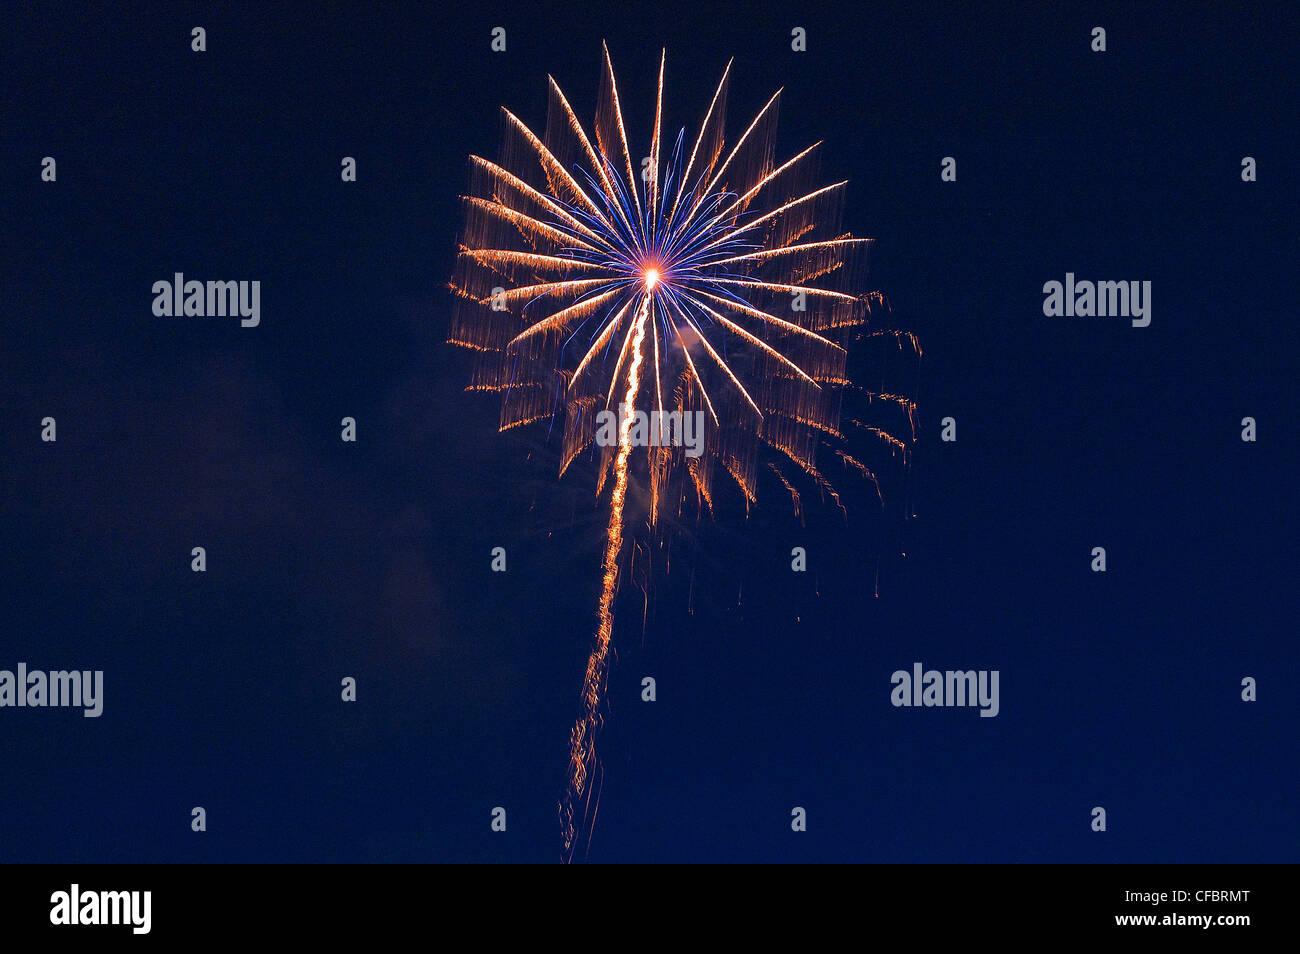 Fires, fireworks, pyrotechnics, rocket, rays, beams, explode, explosion, sky, darkly, sky, brightly, illuminates, - Stock Image